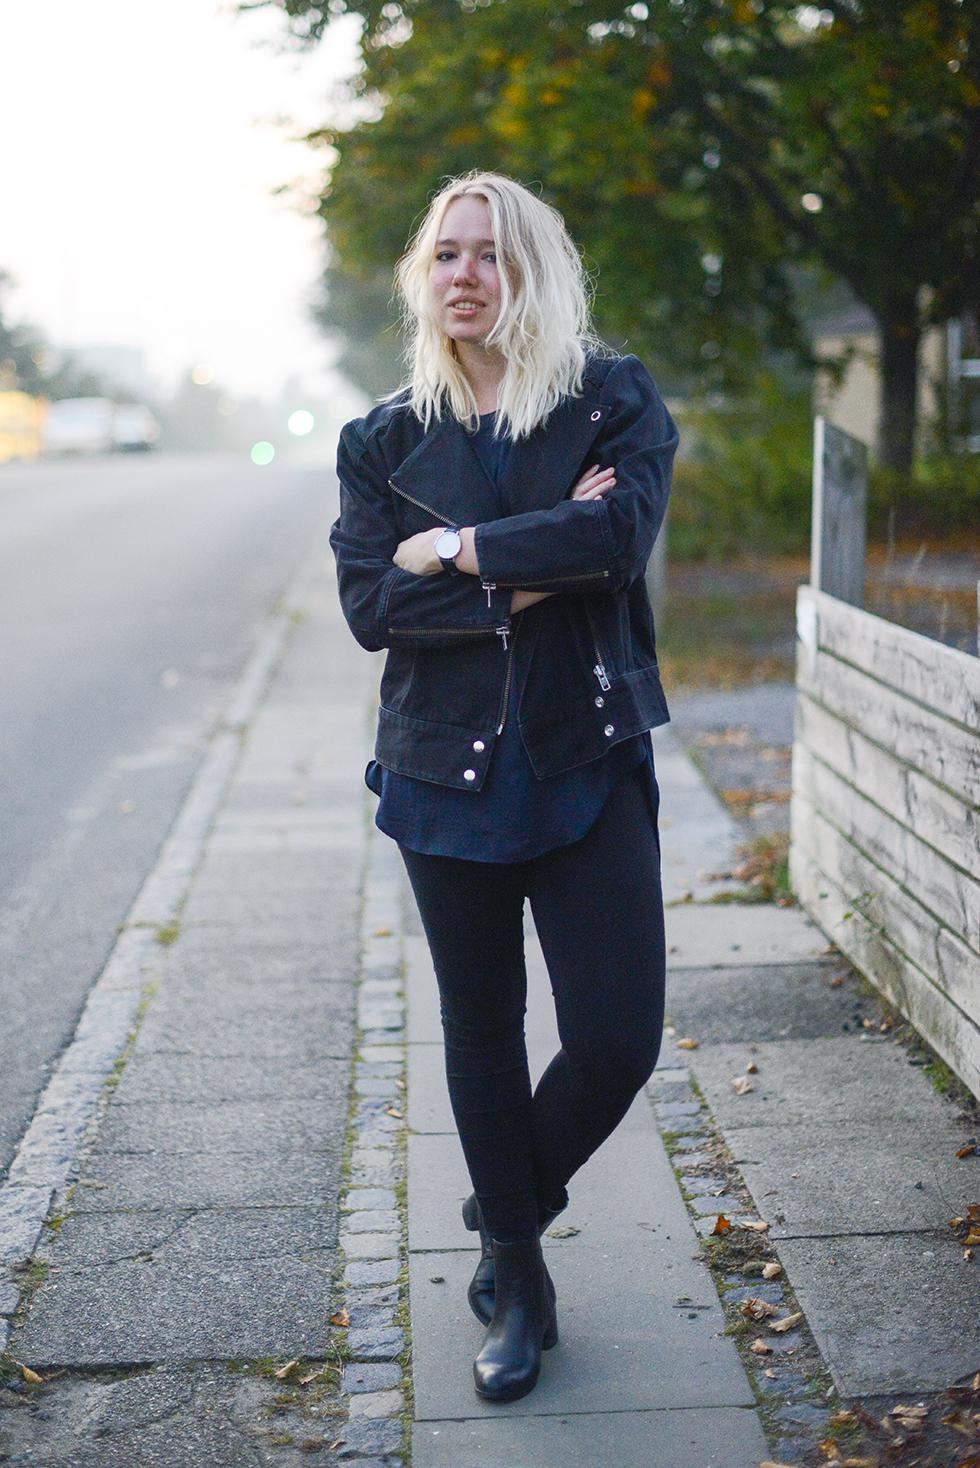 joanna egeberg